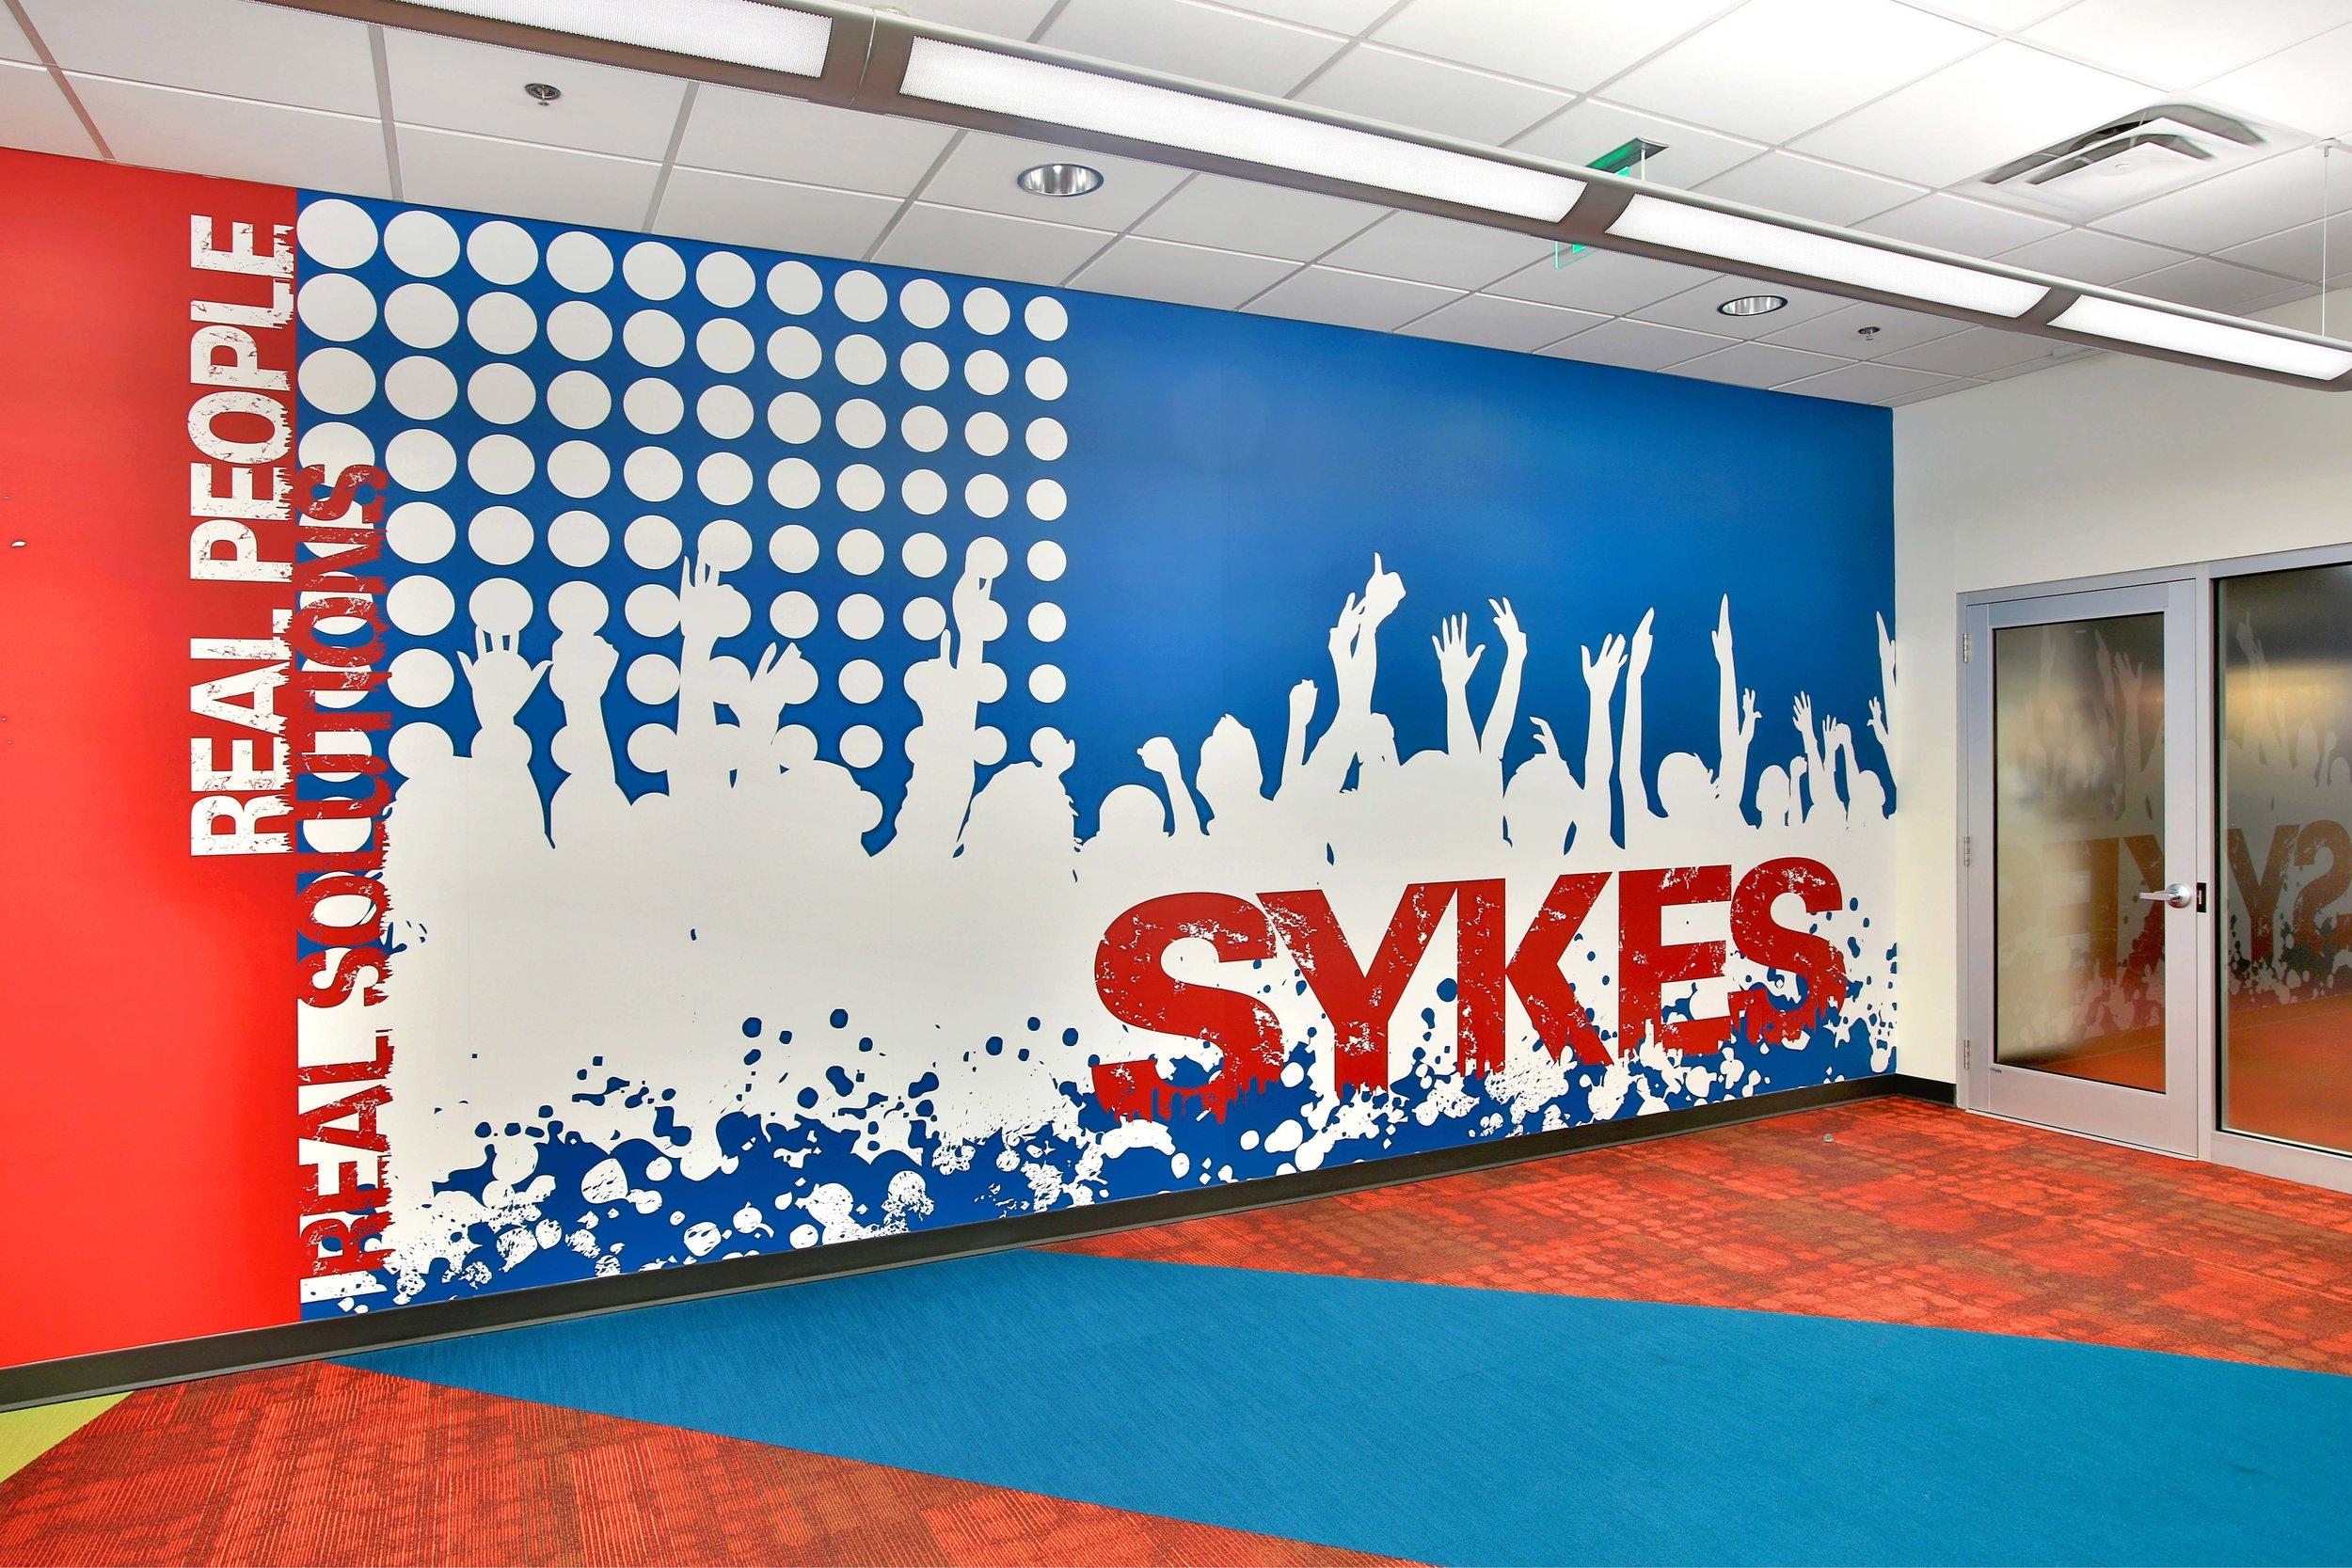 14-0417-116-Sykes.jpg